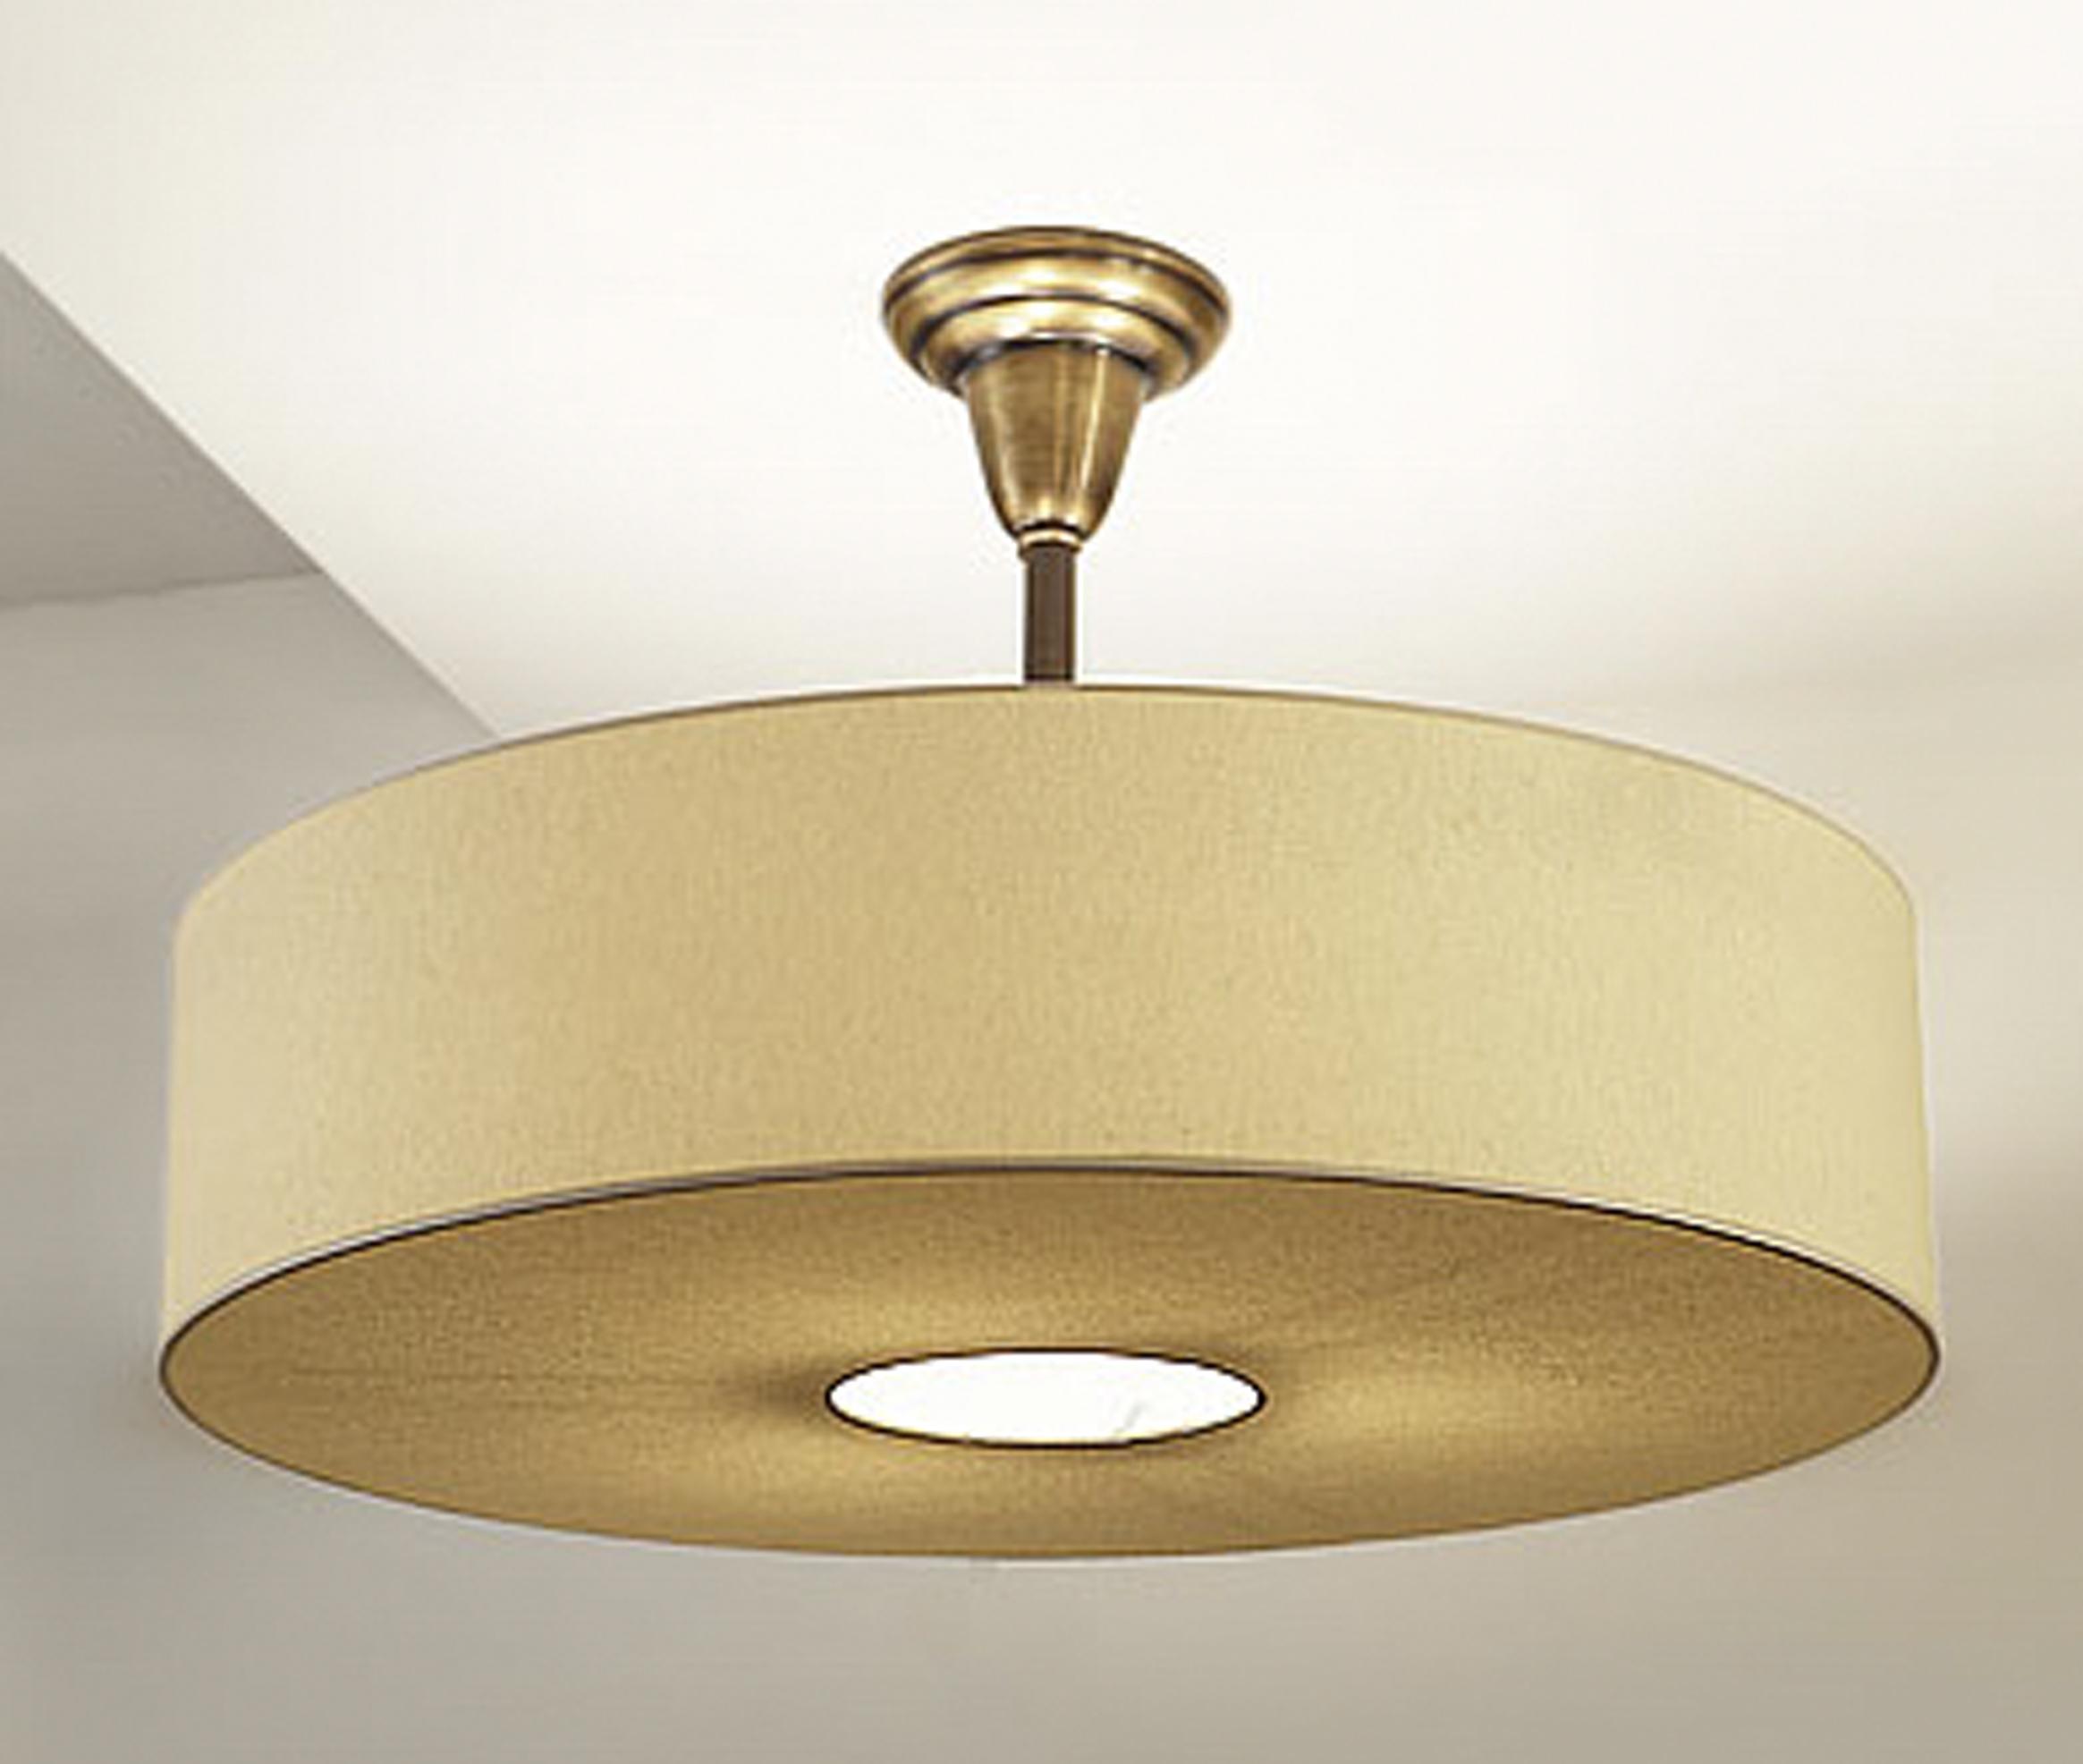 Spencer Pendant  Antique Brass / beige linen shade.